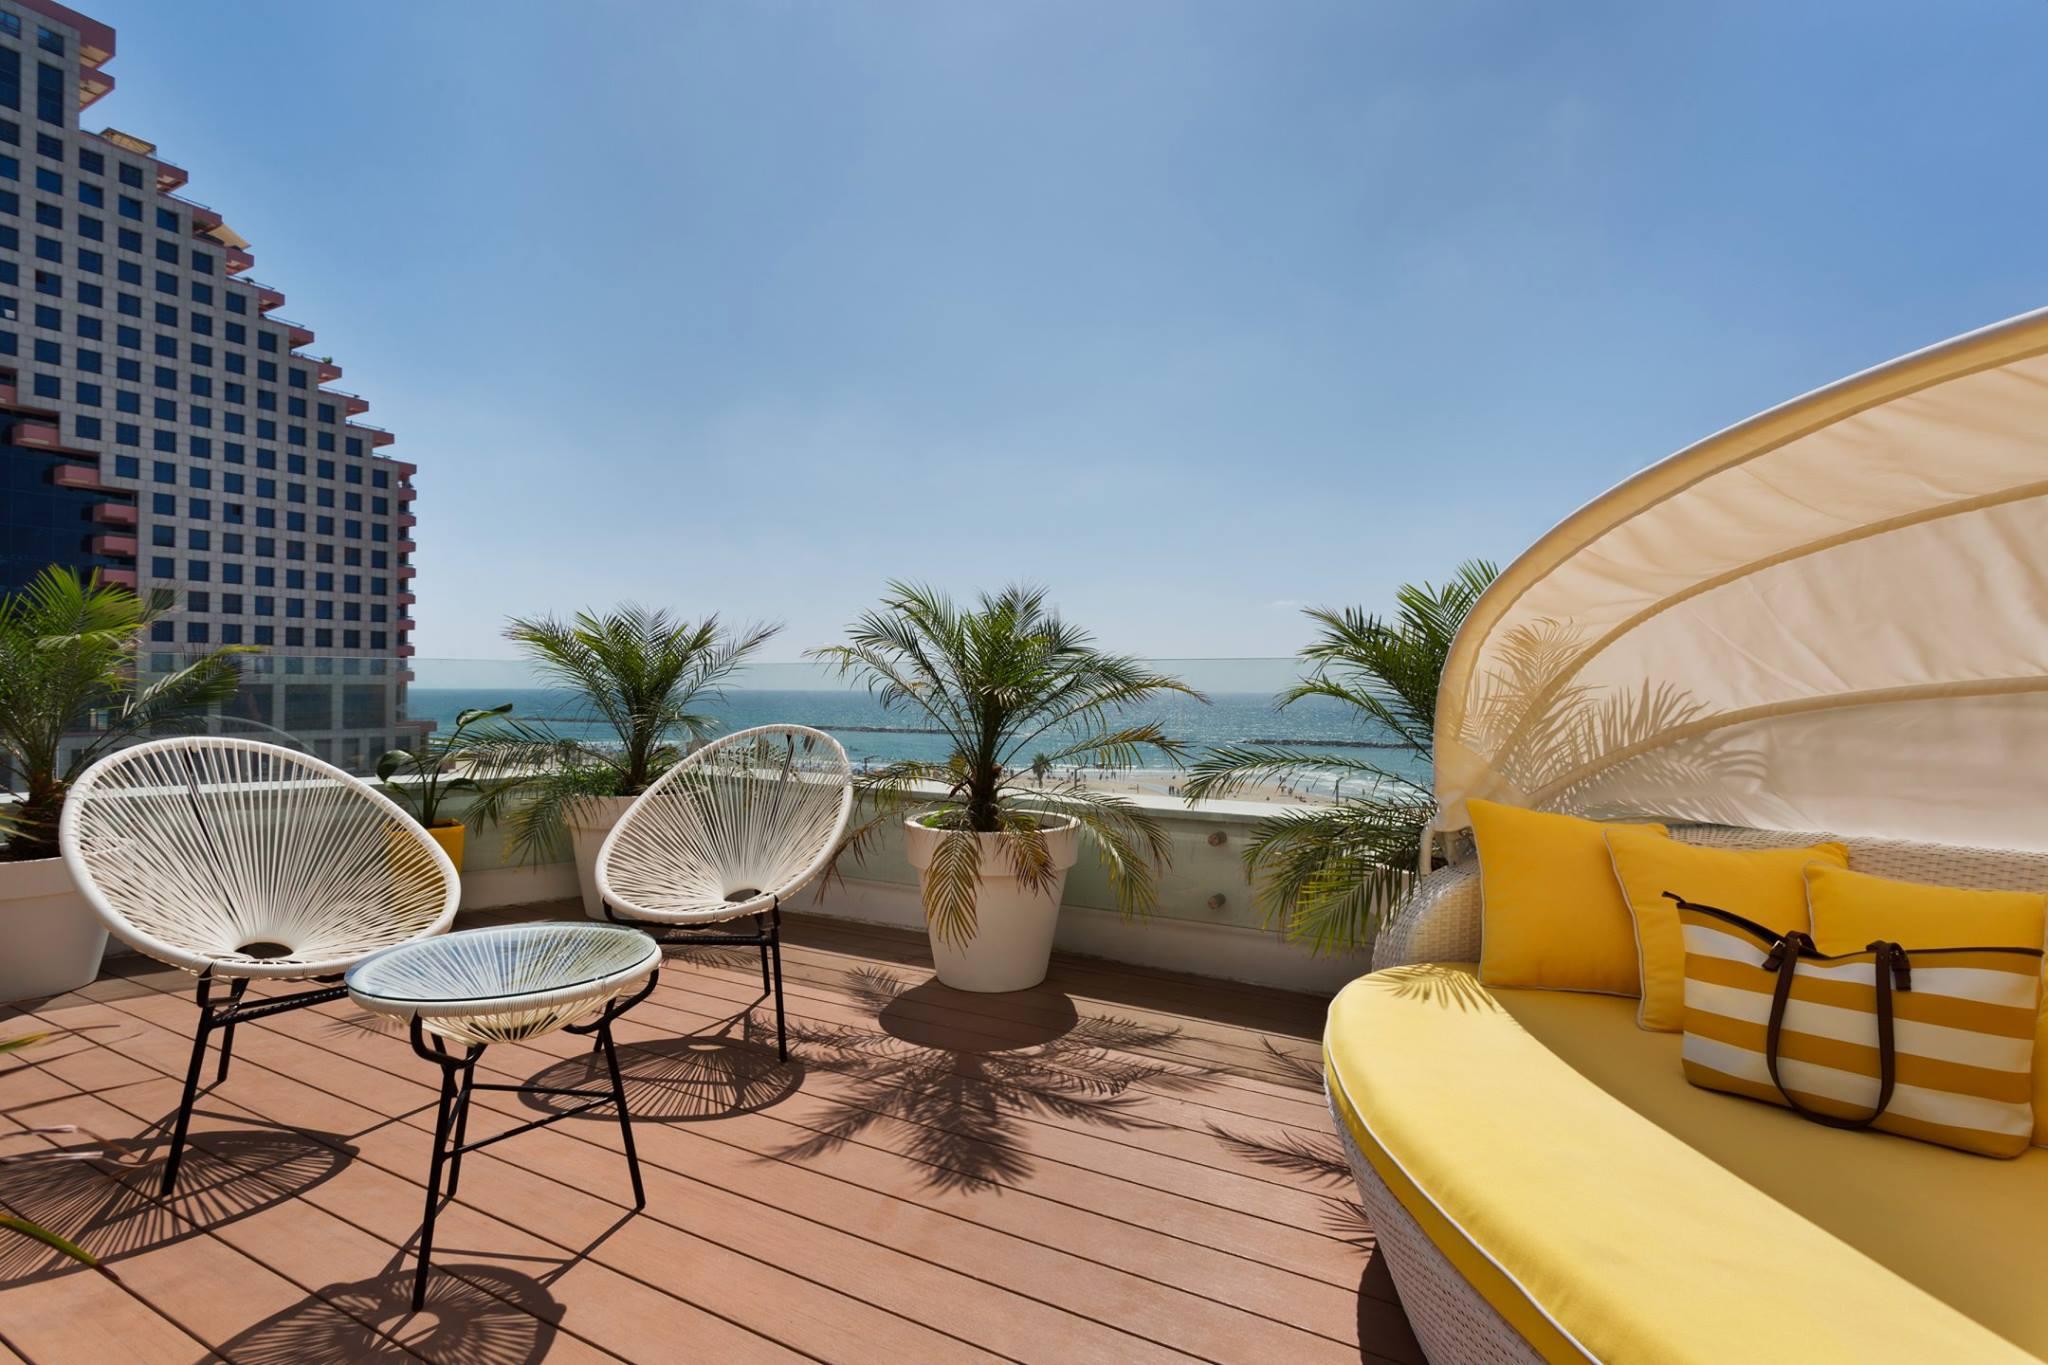 Brown Beach House - hotel in Tel Aviv.